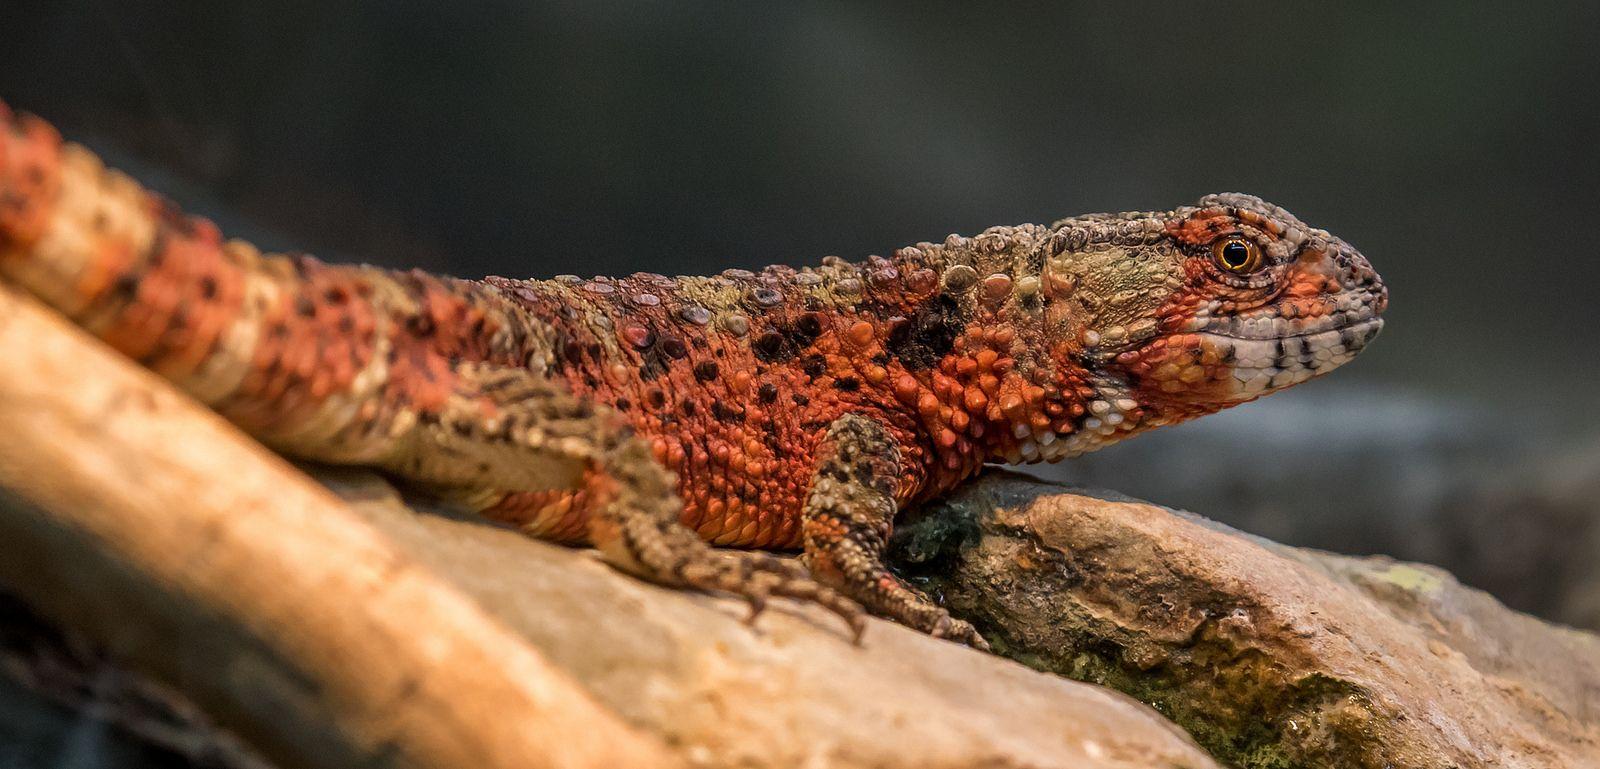 Chinese Crocodile Lizard | by Bob Worthington Photography